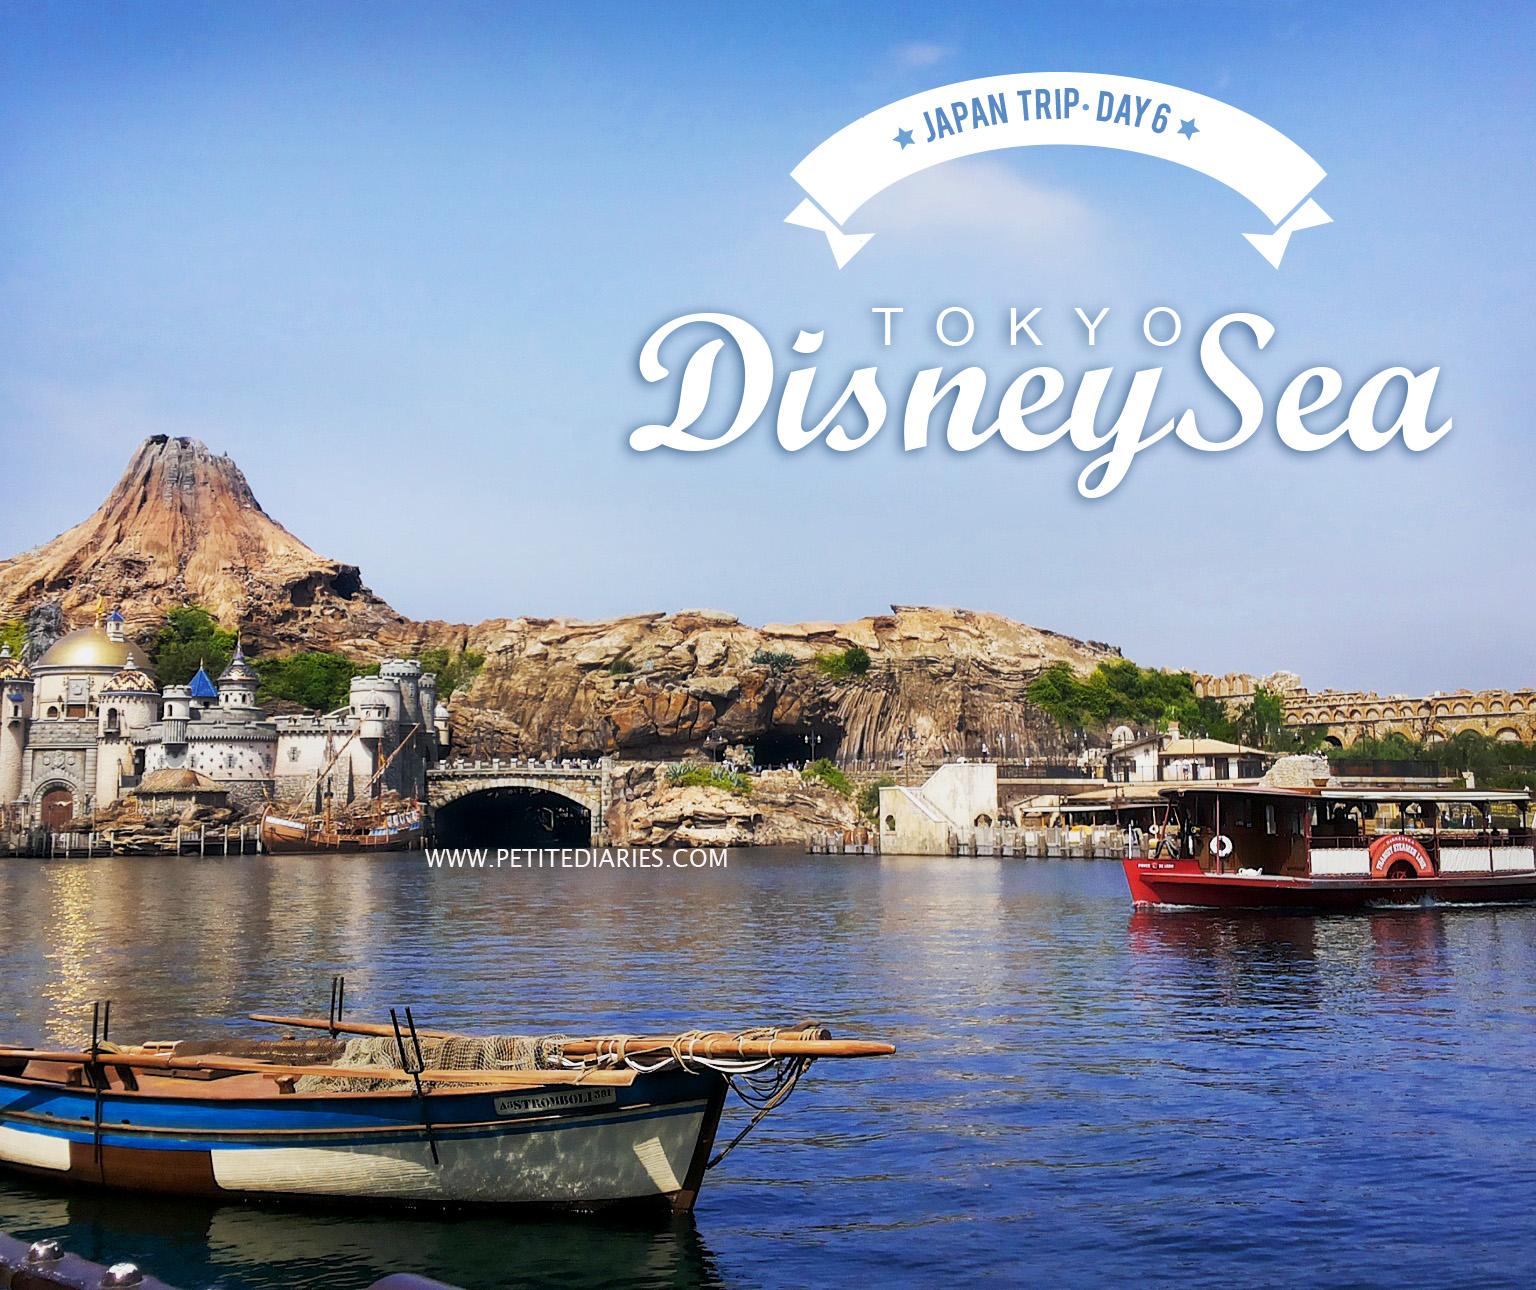 disneysea tokyo travel experience